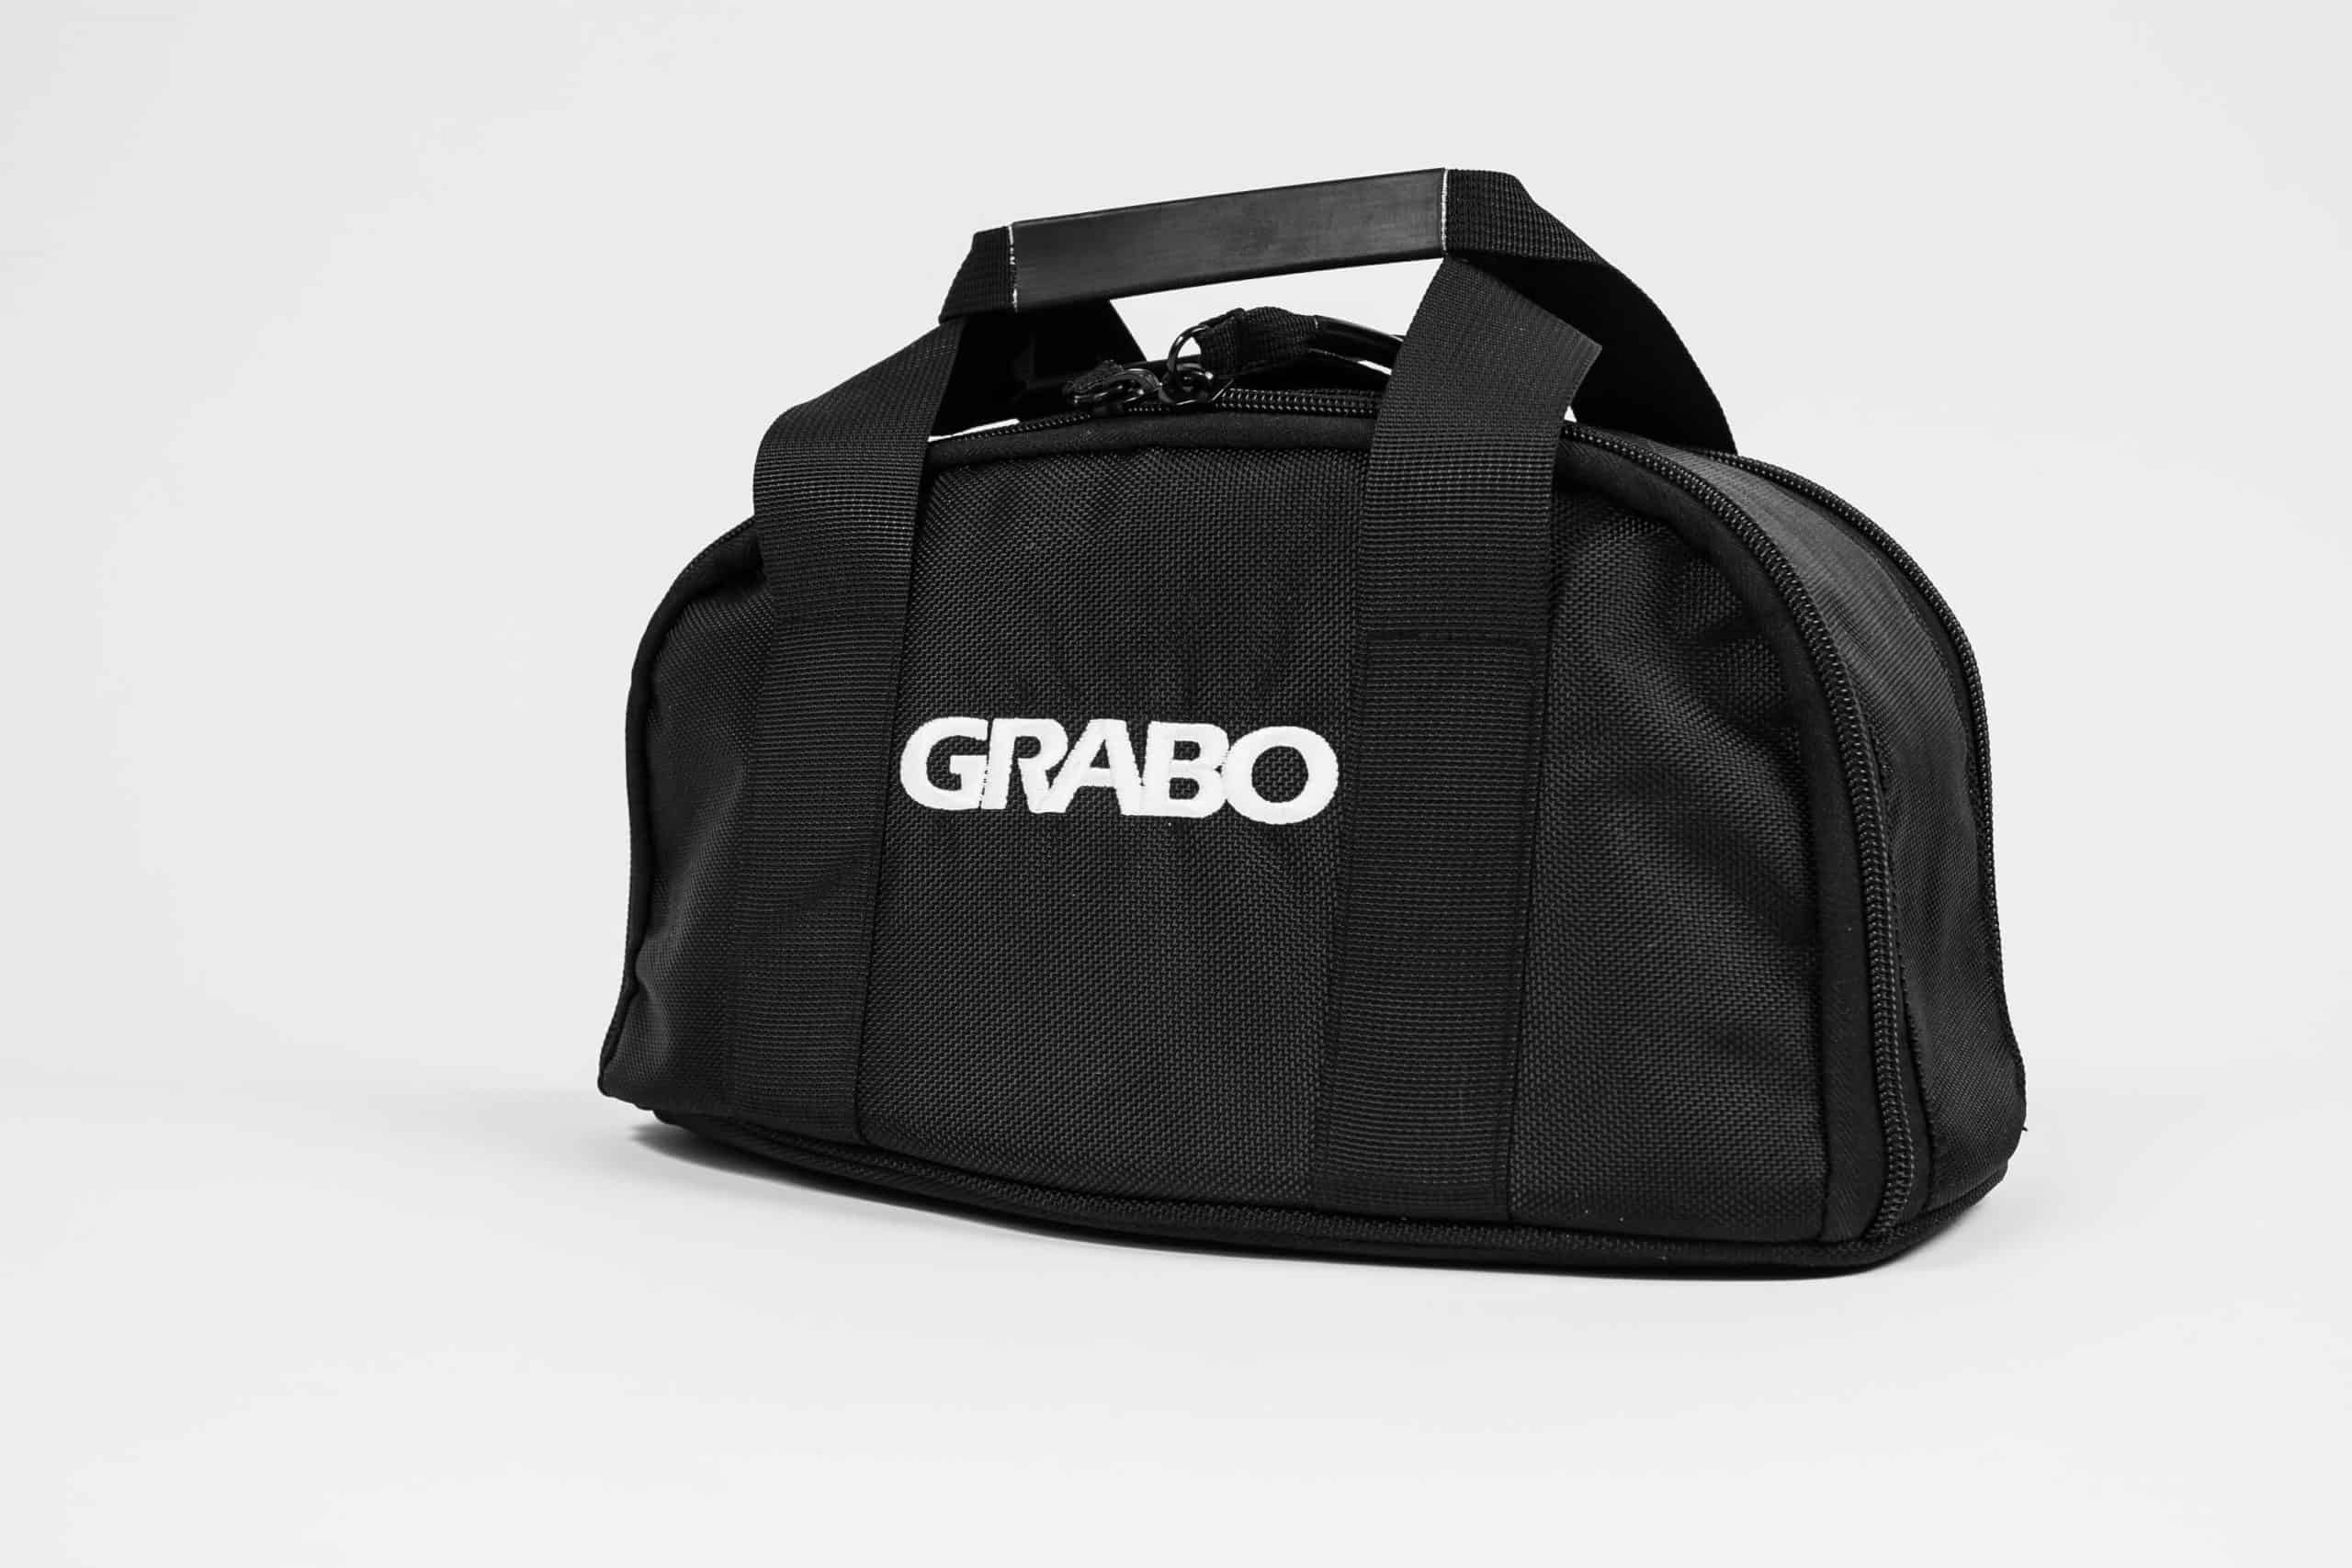 GRABO glass vacuum lifter bag